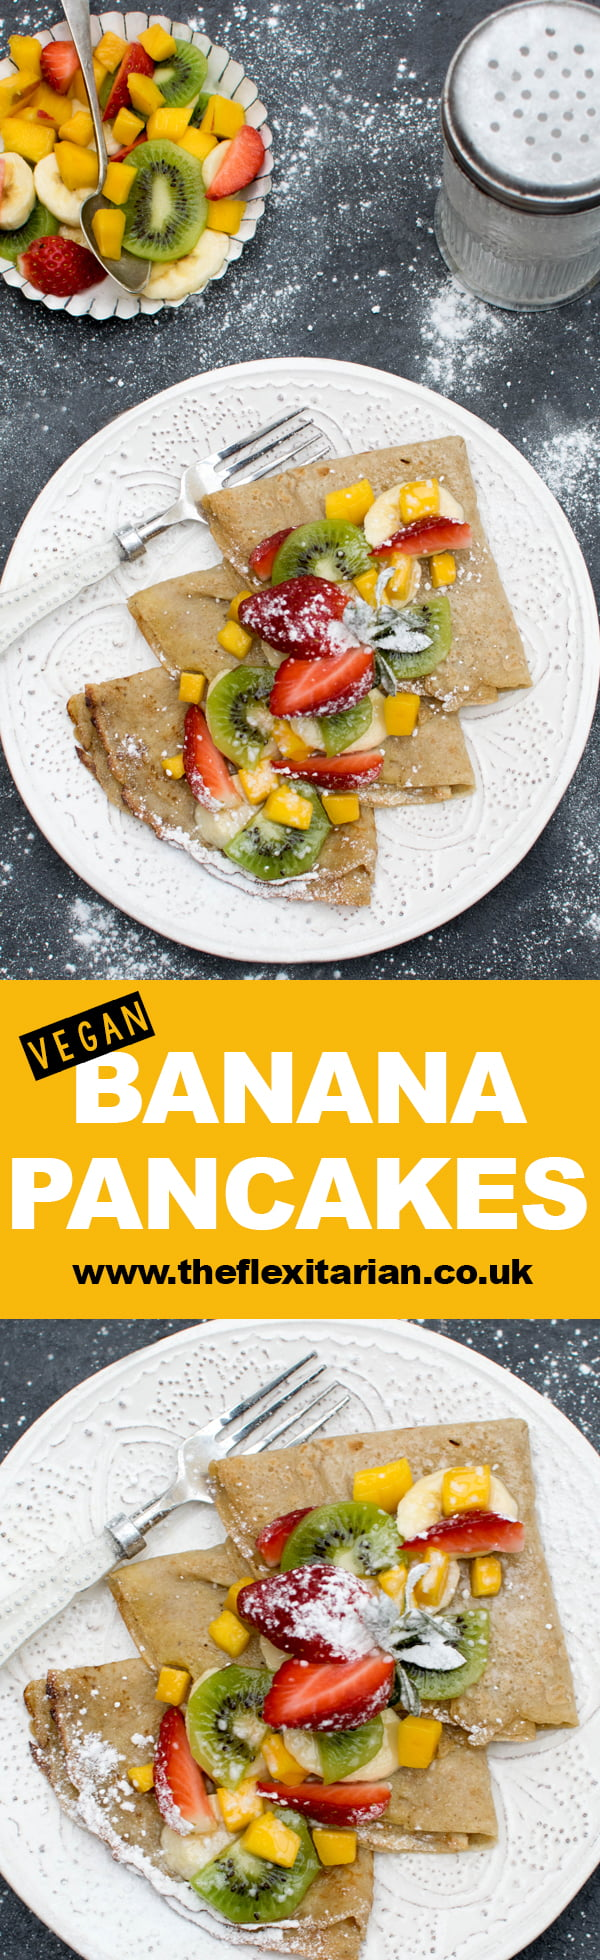 Banana Pancakes [vegan] by The Flexitarian